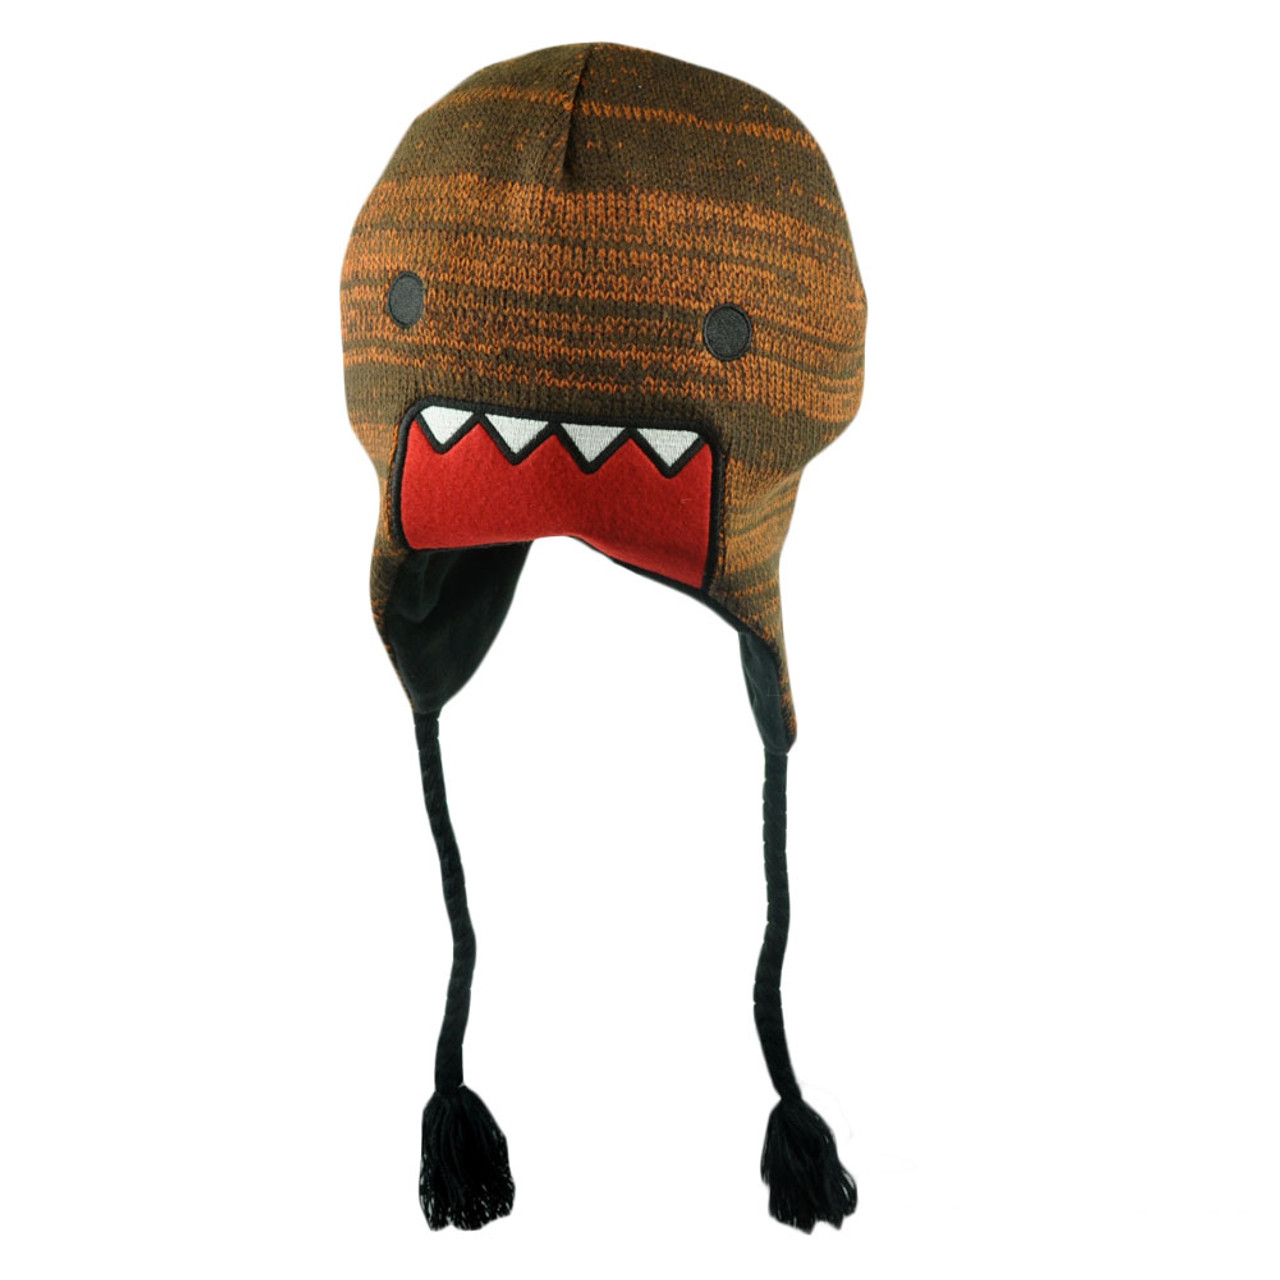 e53c73fff3f Domo Kun Japanese Animation Supreme Lettering Felt Peruvian Knit Beanie Hat  - Cap Store Online.com